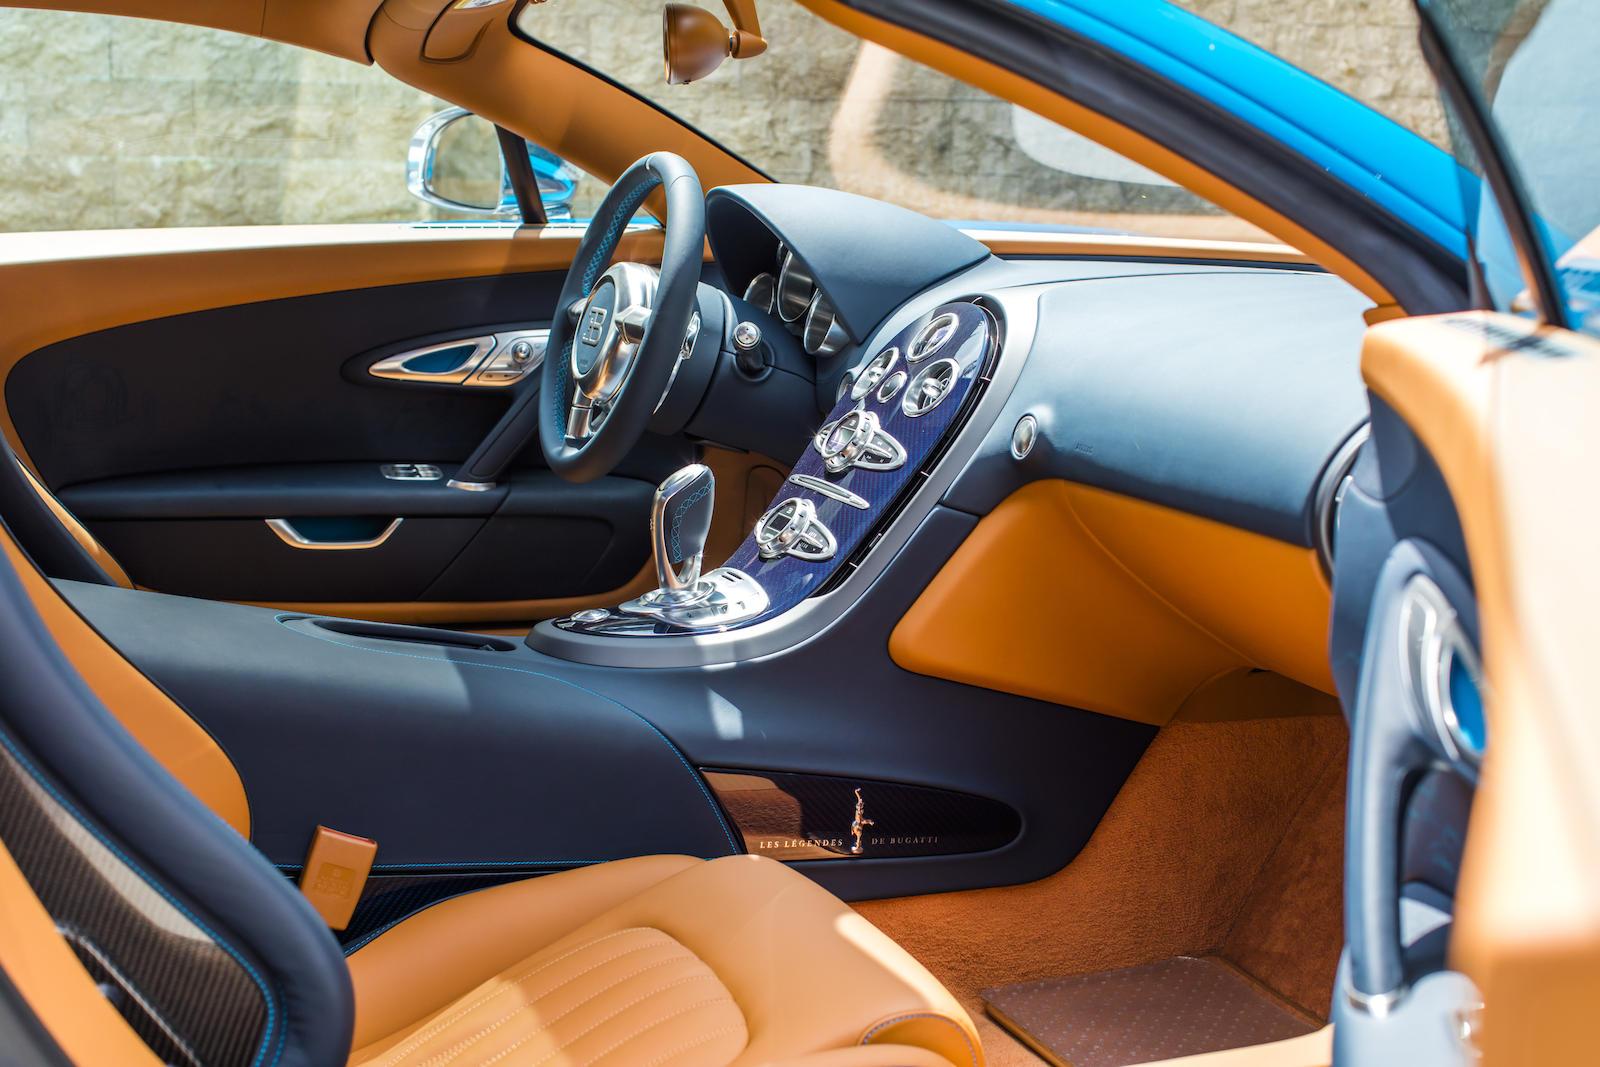 Bugatti Veyron interior front